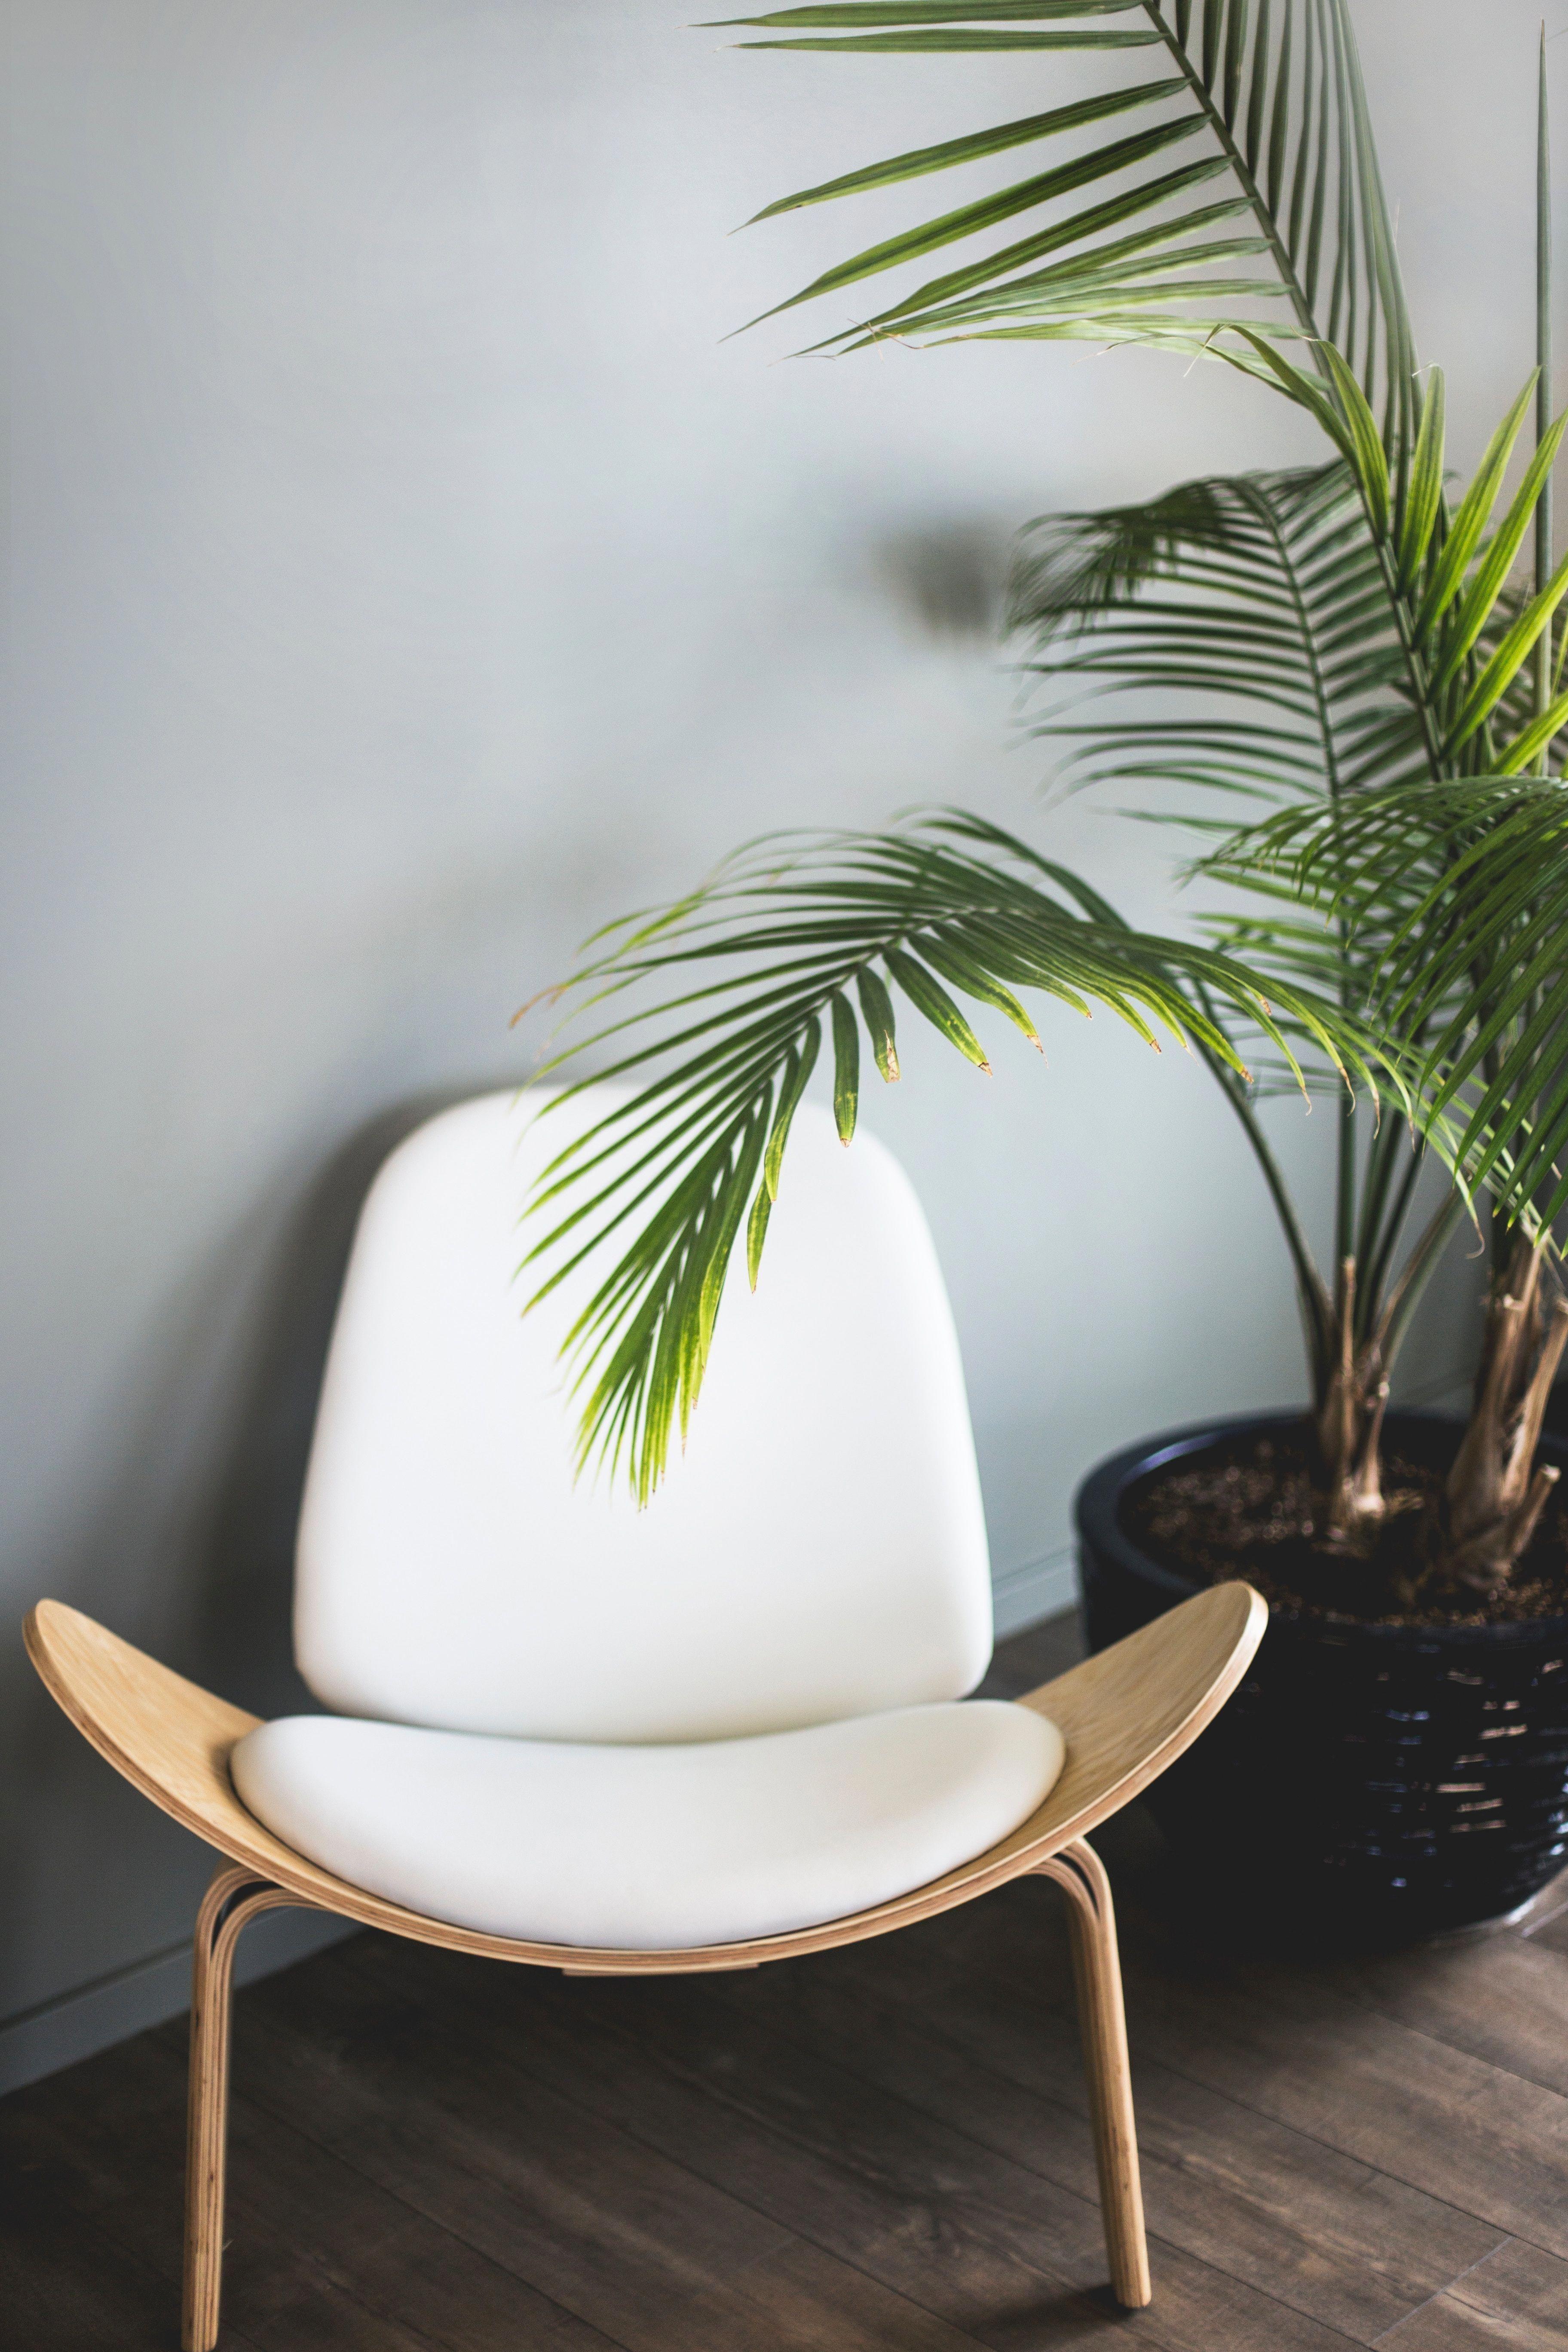 scandinavian indoor plants decor ideas interior design interiordesignideas also rh pinterest